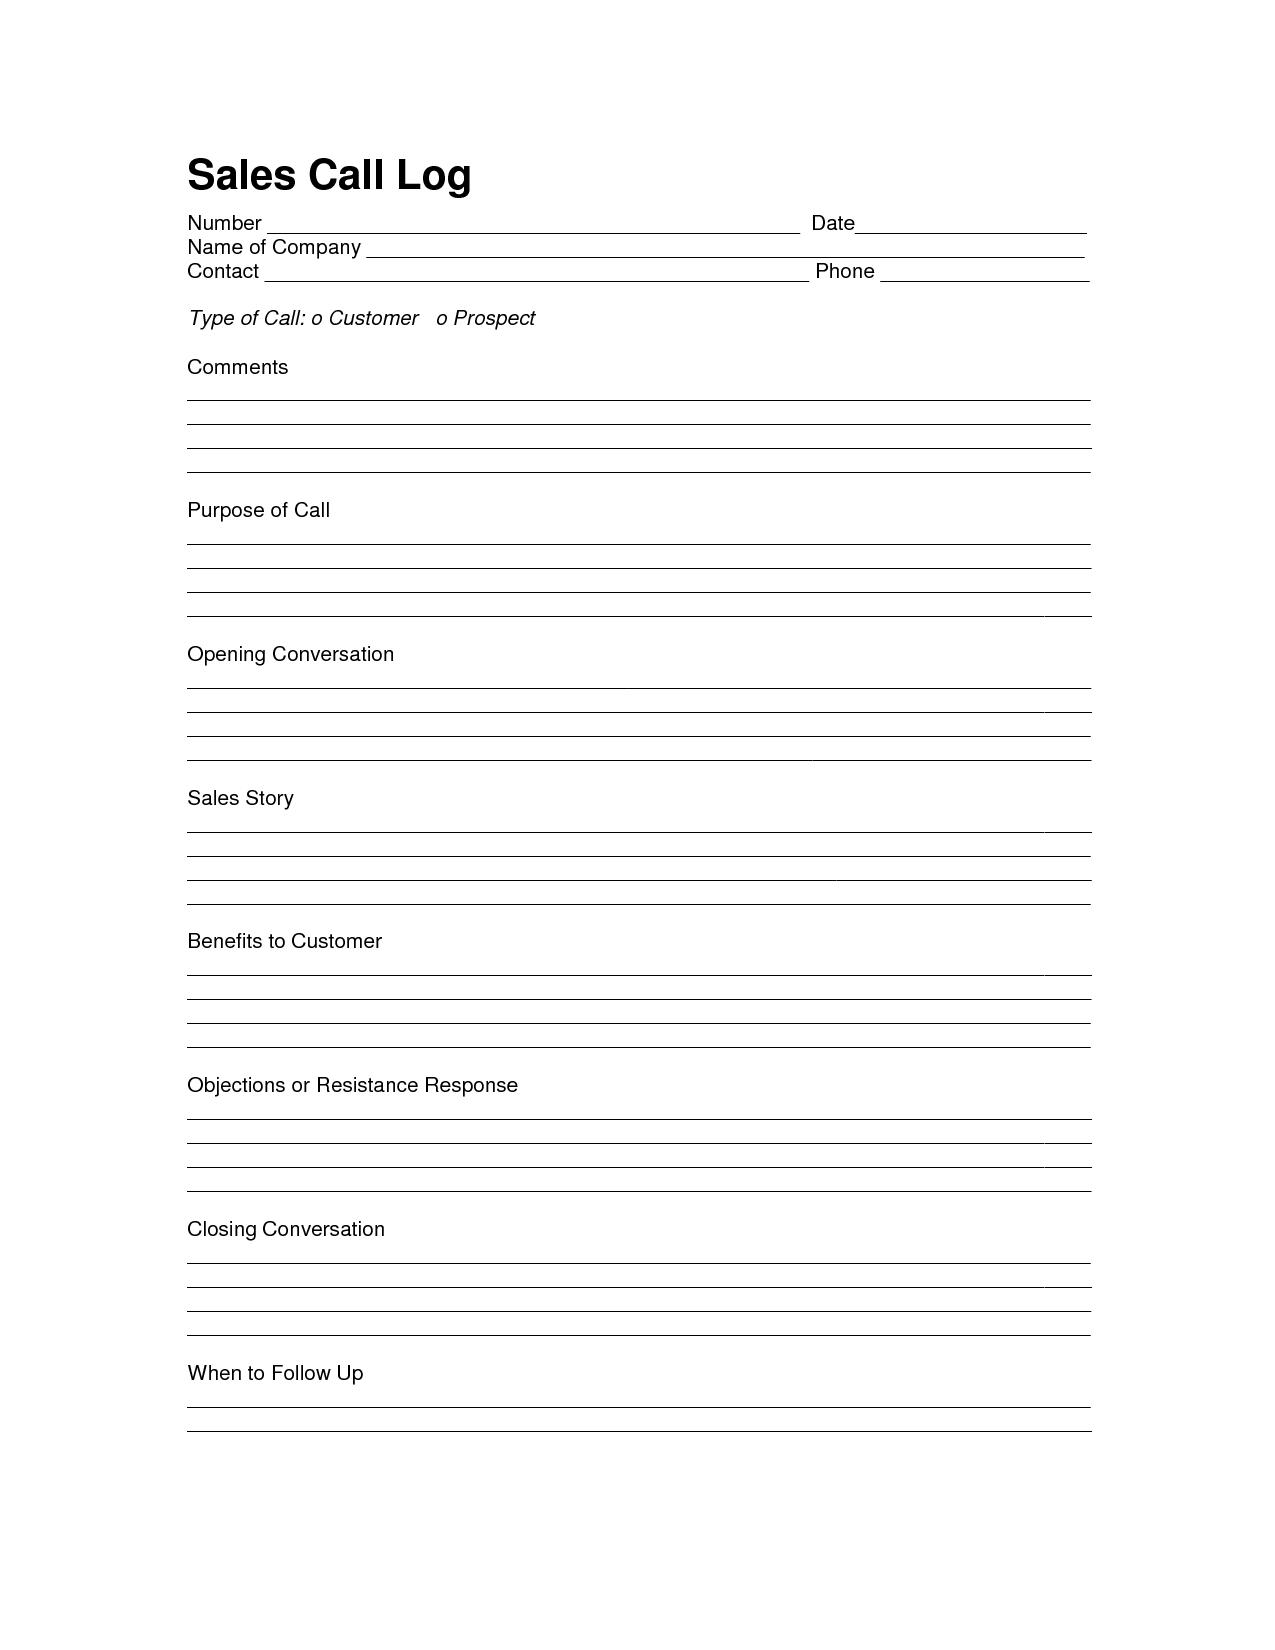 Sales Log Sheet Template  Sales Call Log Template  Call Log Regarding Sales Call Report Template